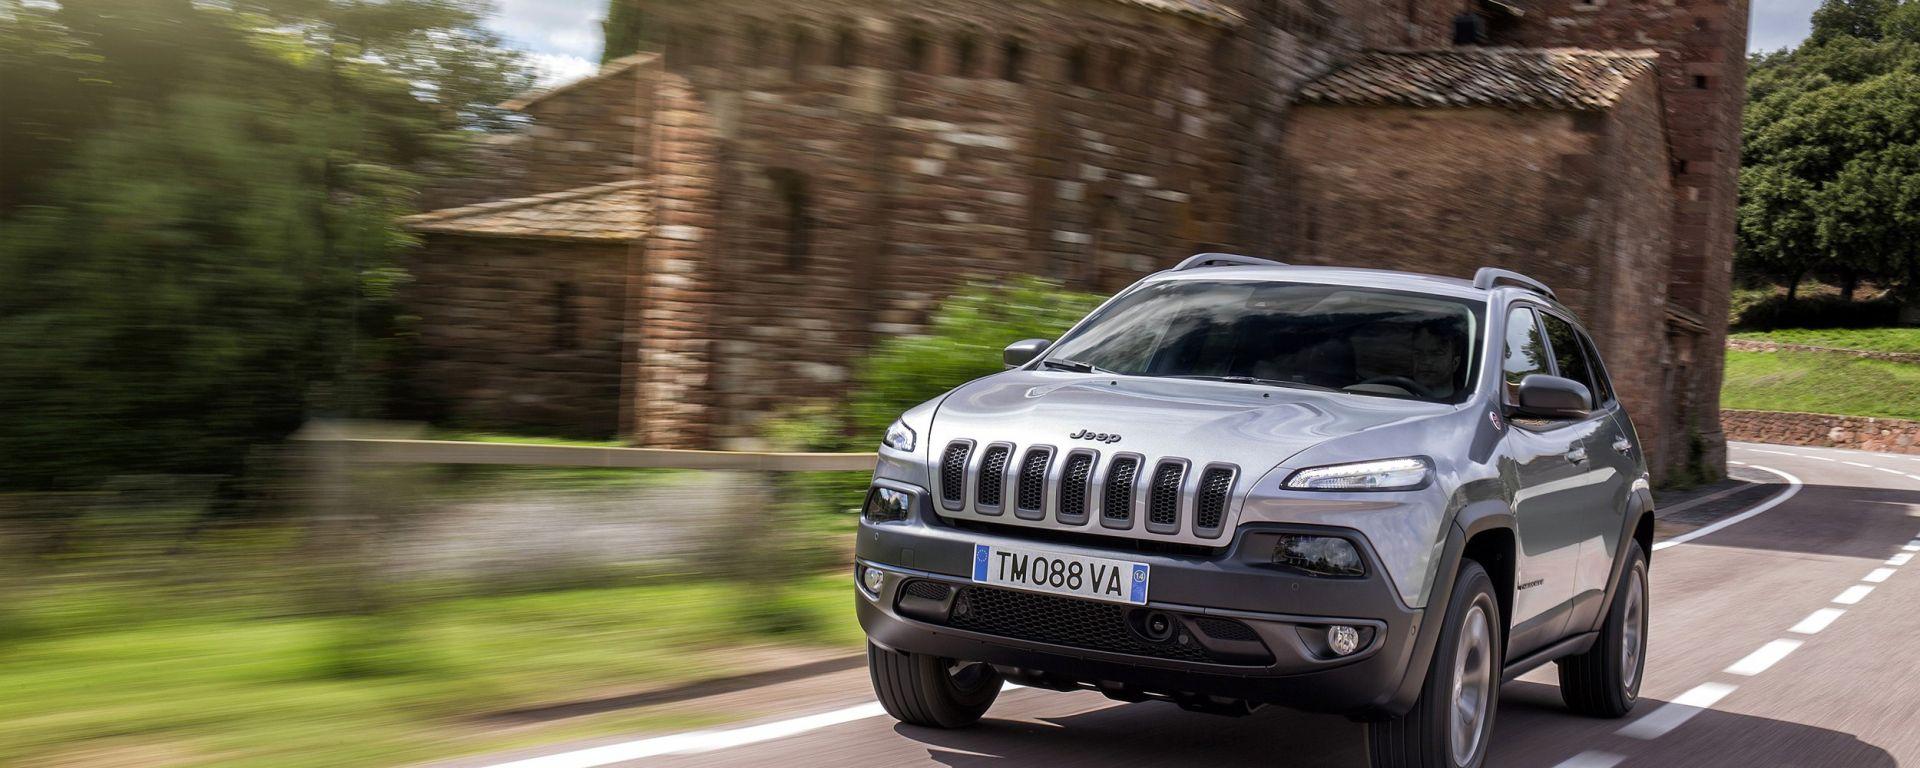 Jeep Cherokee 2014, la versione europea